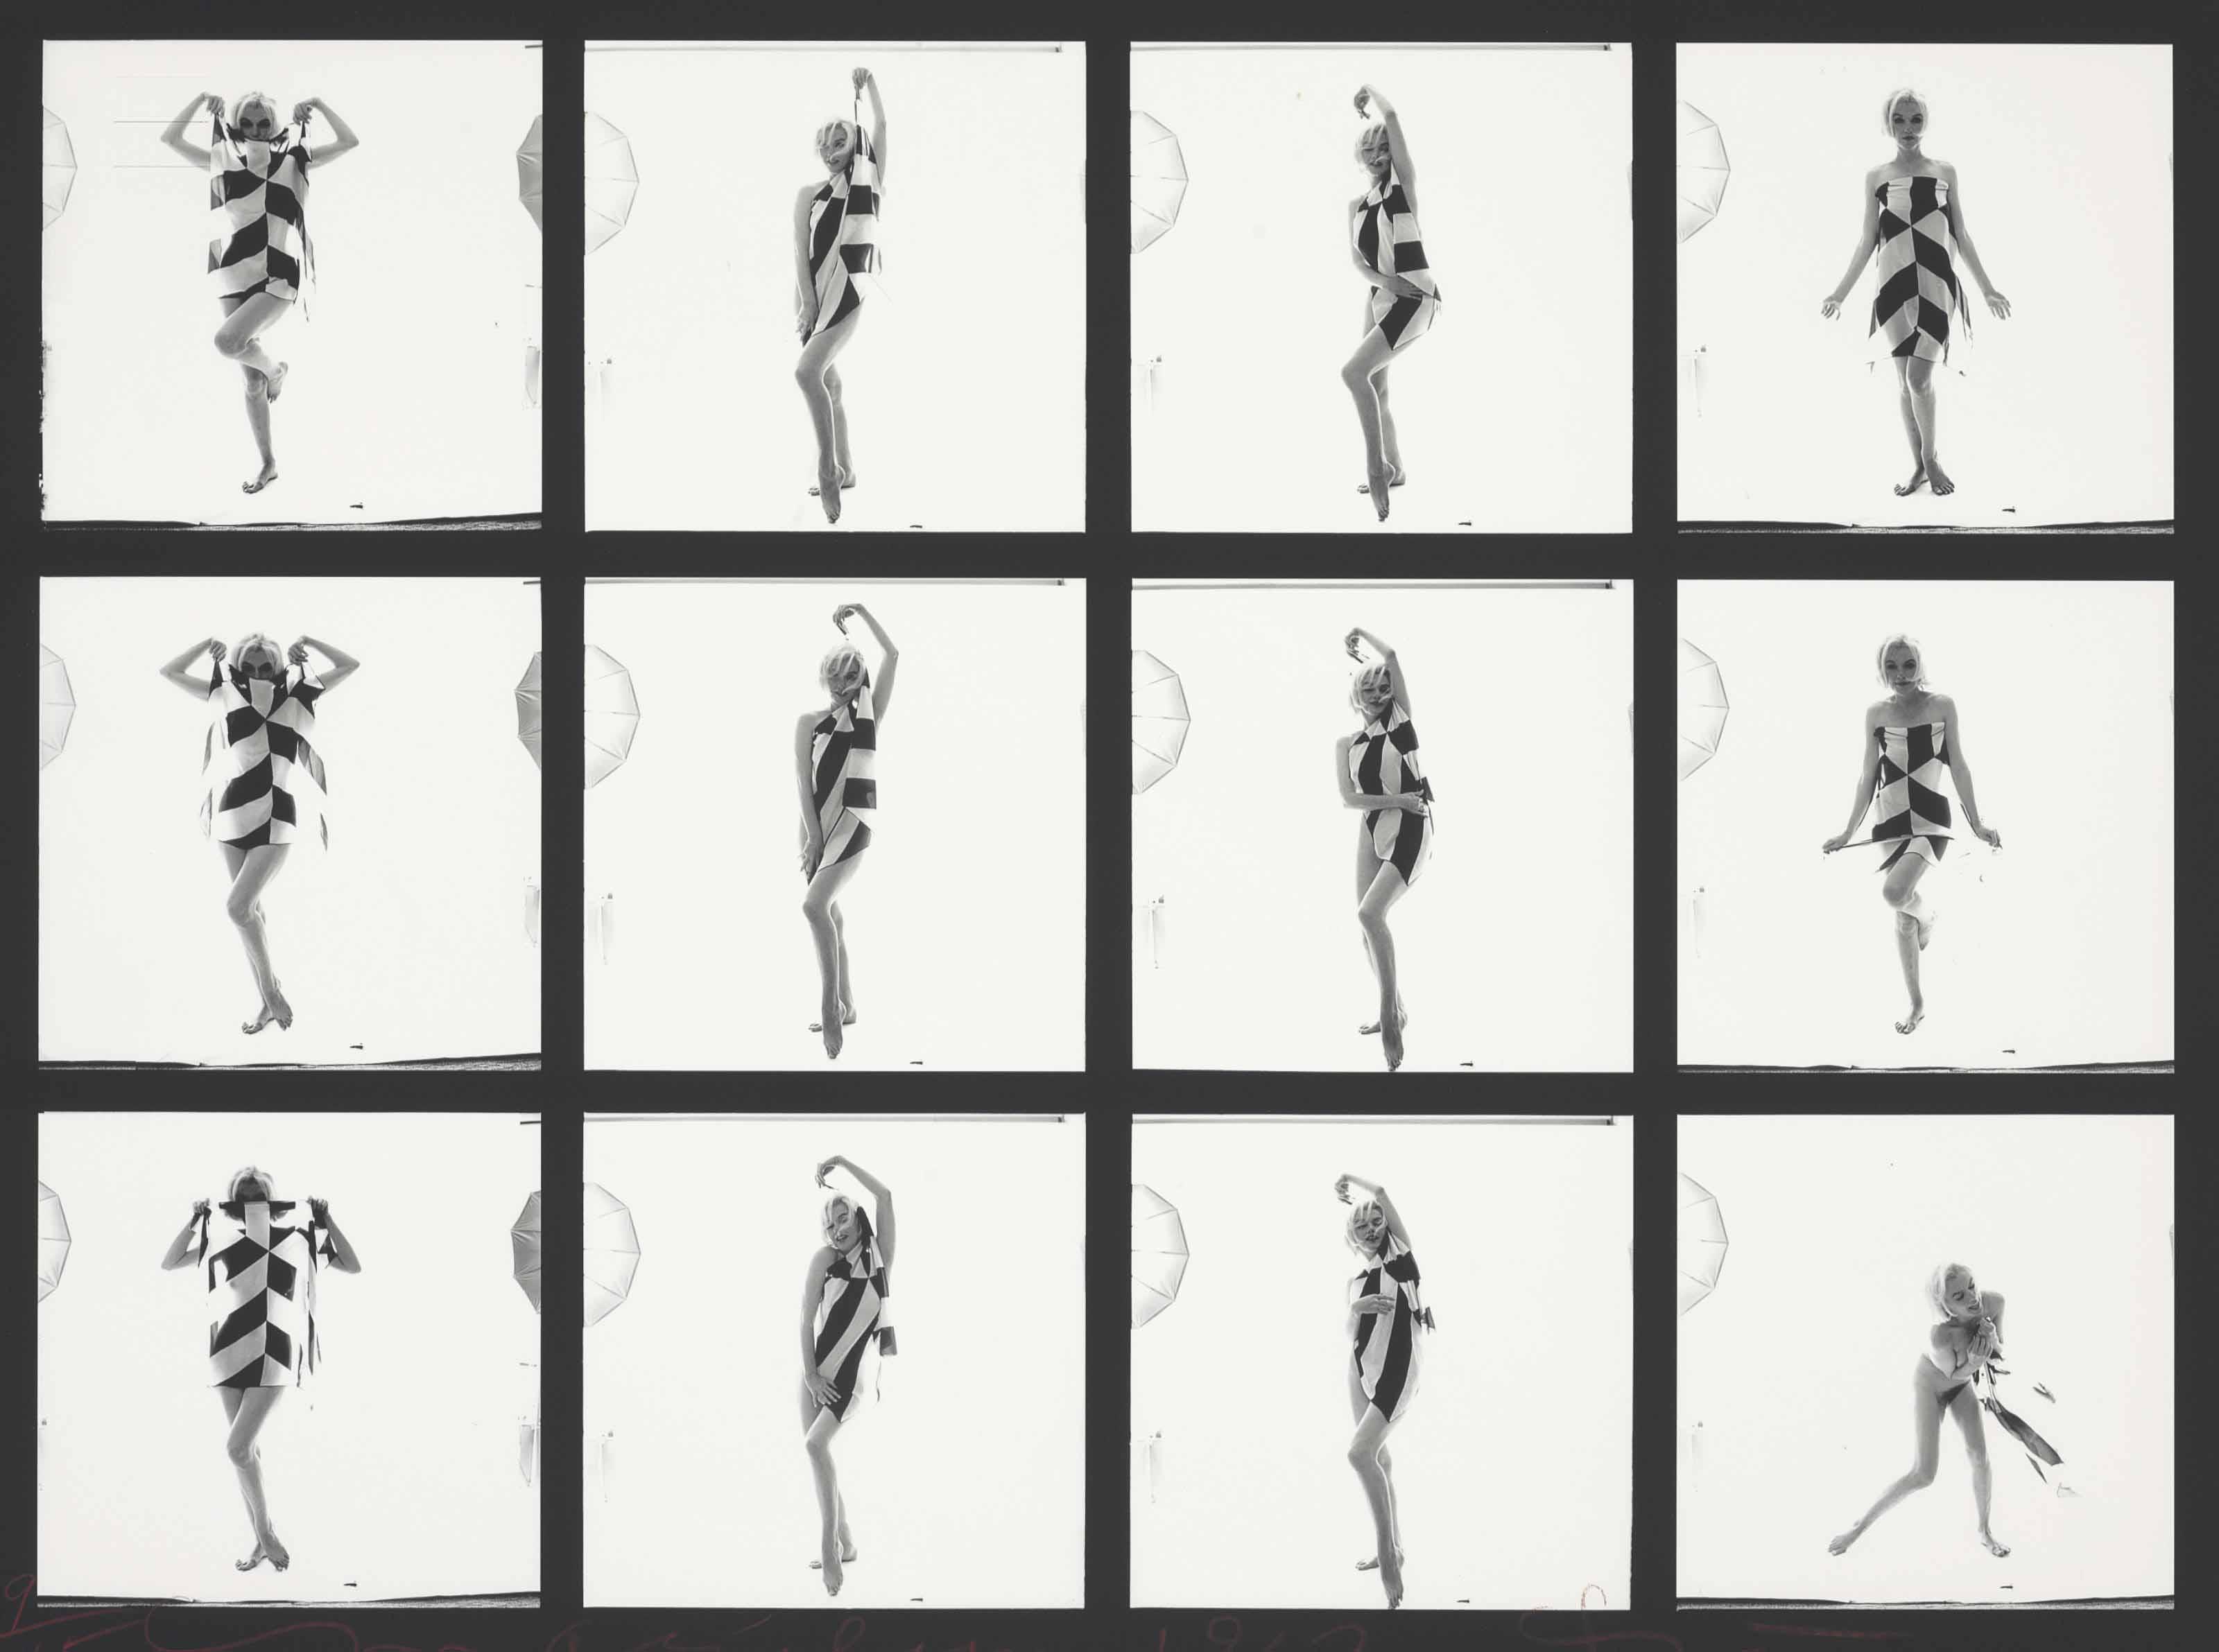 Marilyn, from 'Last Sitting', 1962